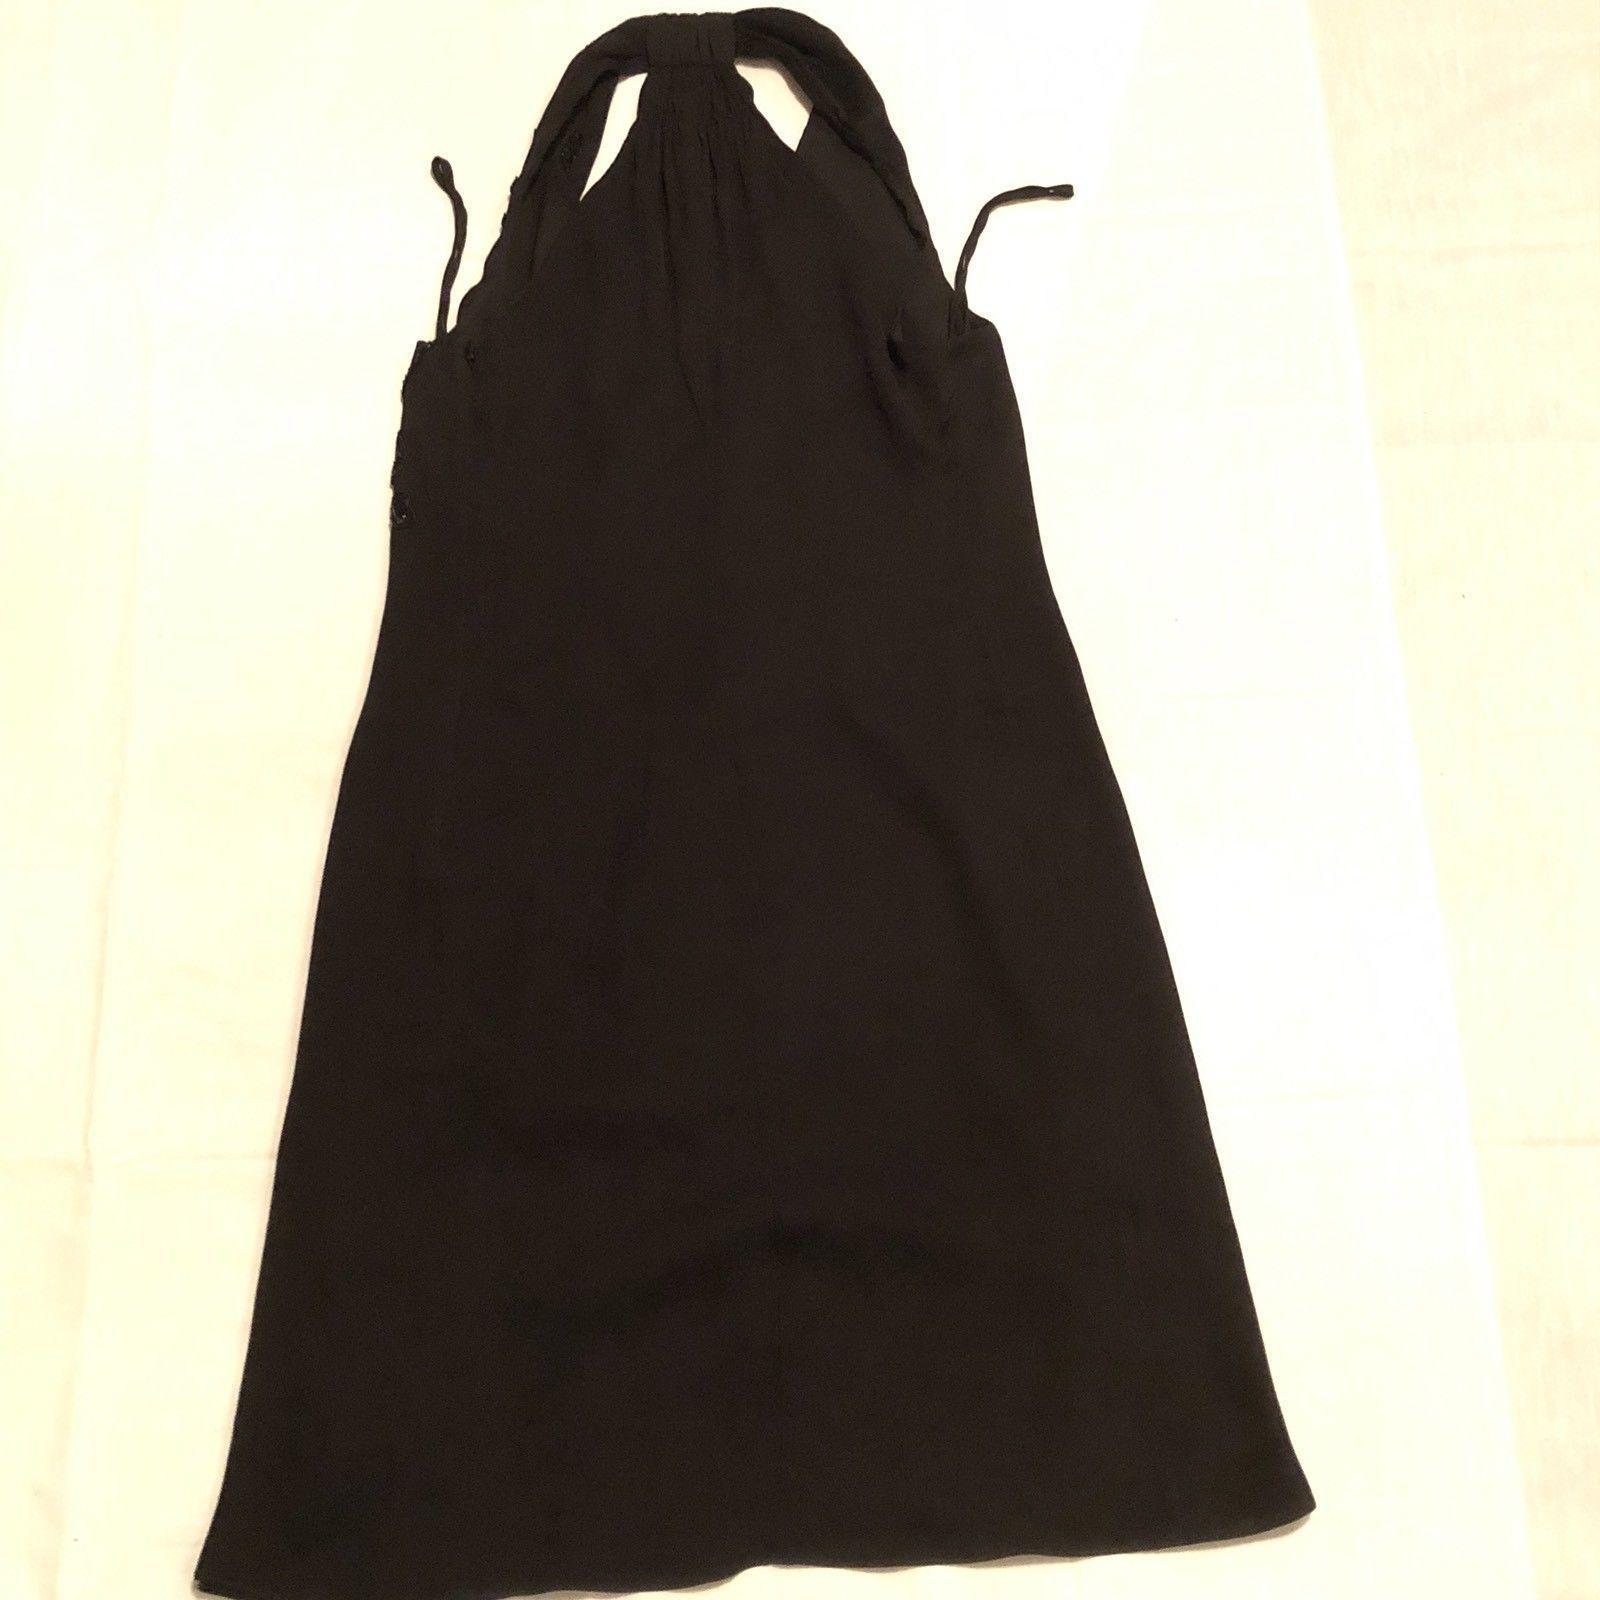 Armani Collezioni Black Halter Lined Dress Size 10 EU 46 Prom Evening image 8